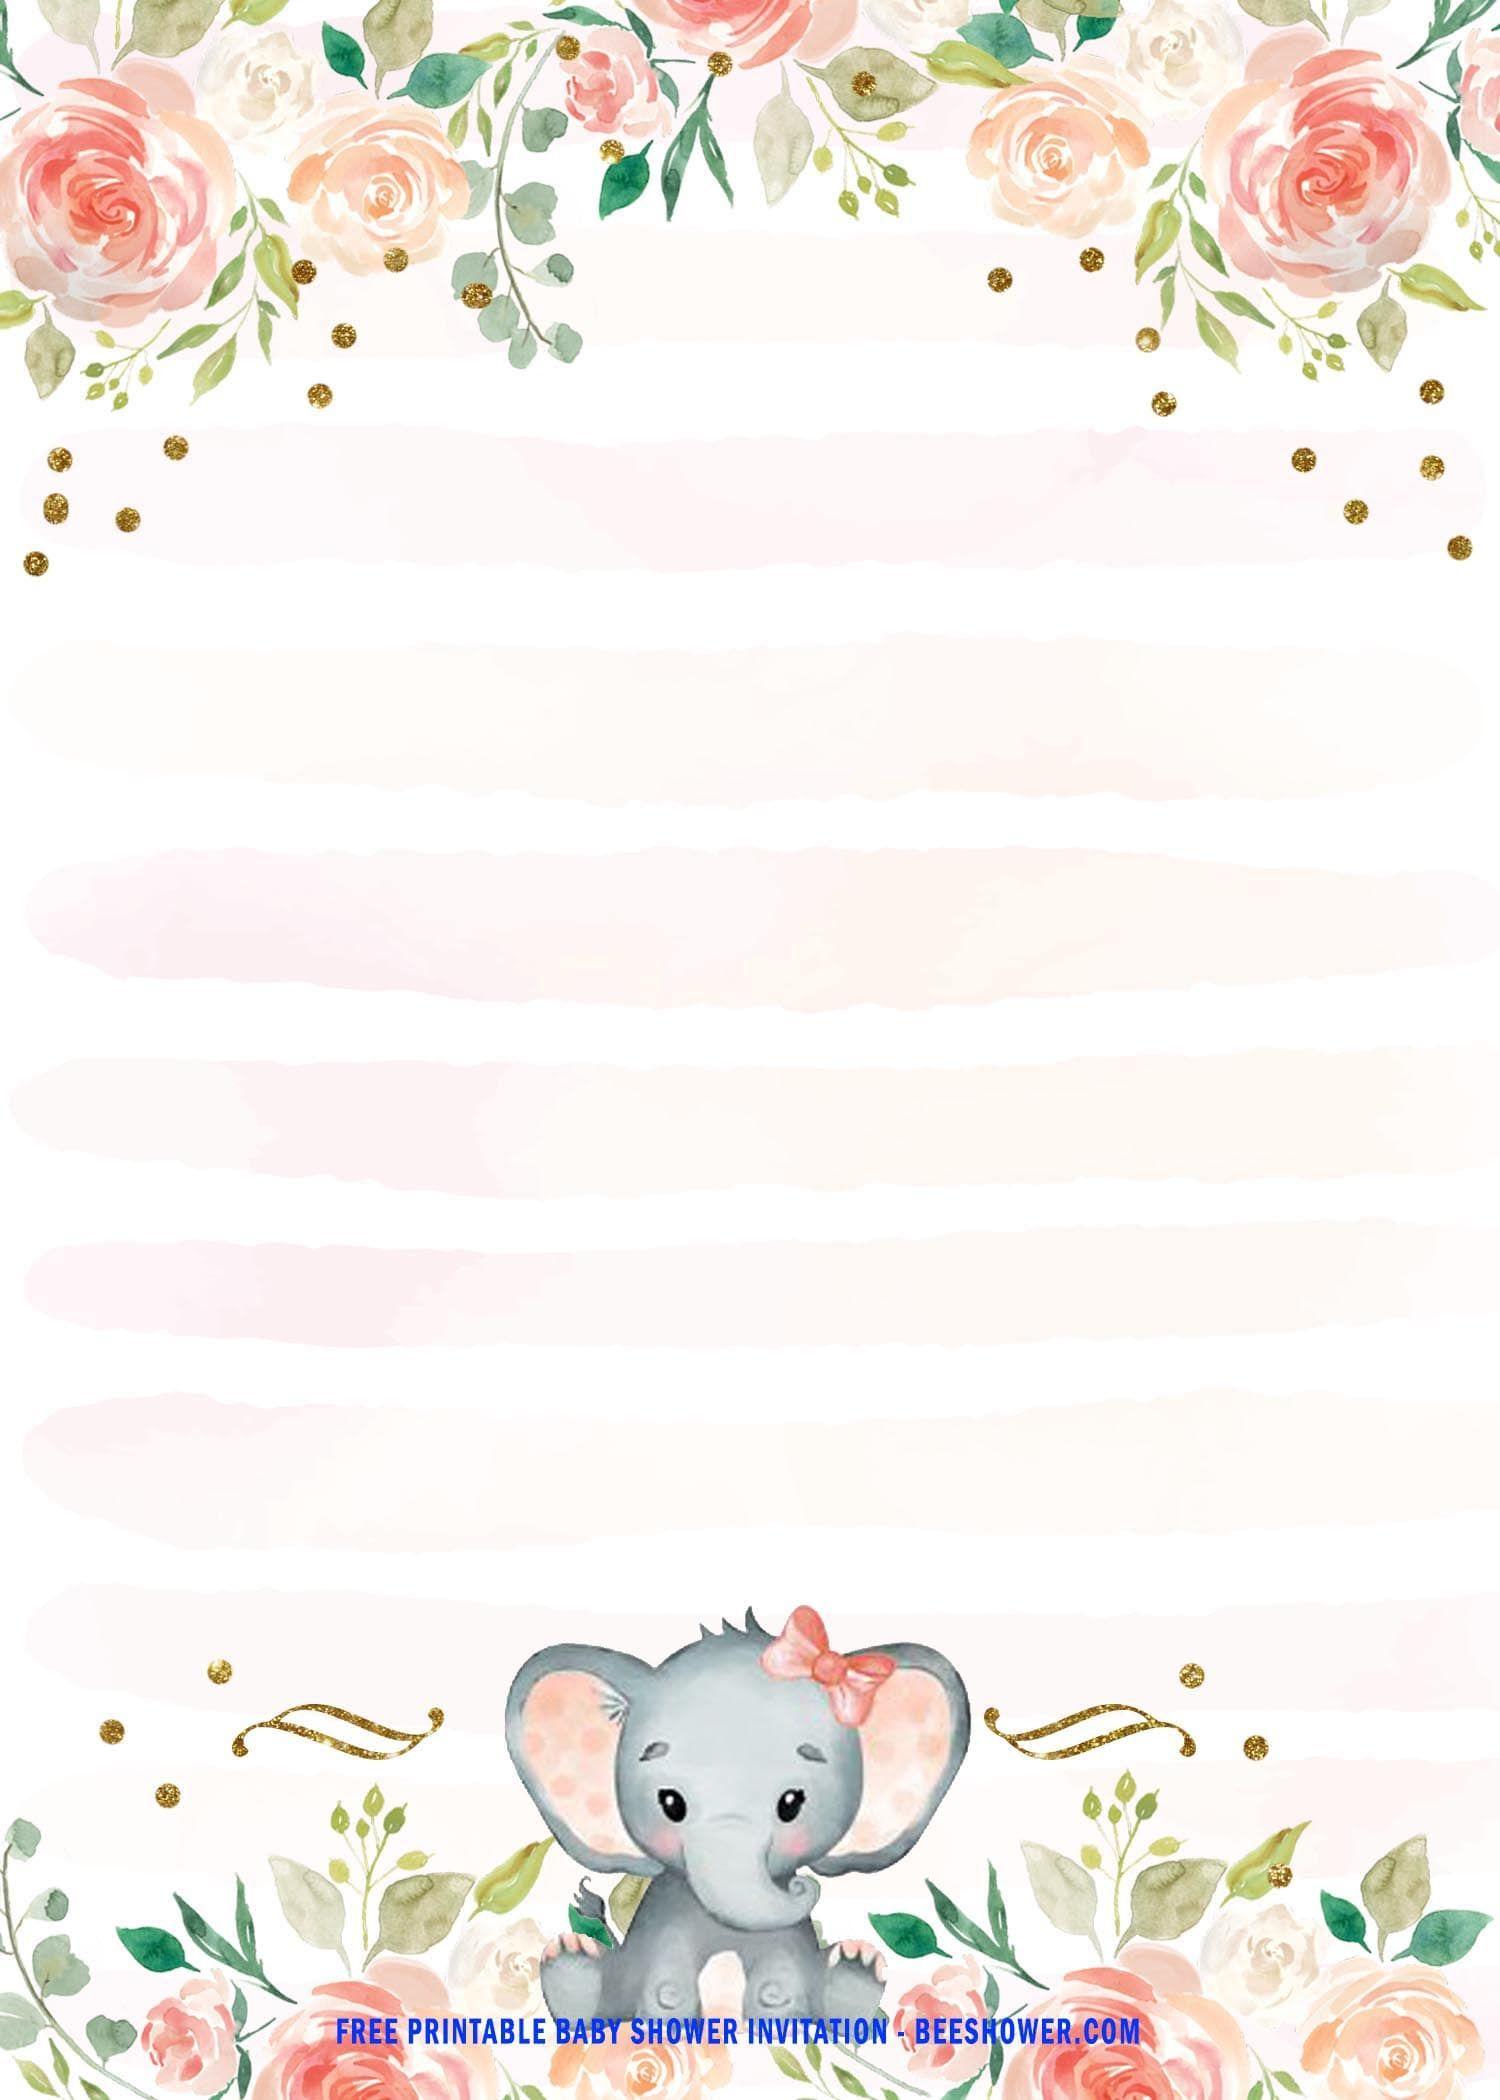 Pink Elephant Baby Shower Free Printables : elephant, shower, printables, Printable, Elephant, Shower, Invitation, Templates, Invitations,, Invites